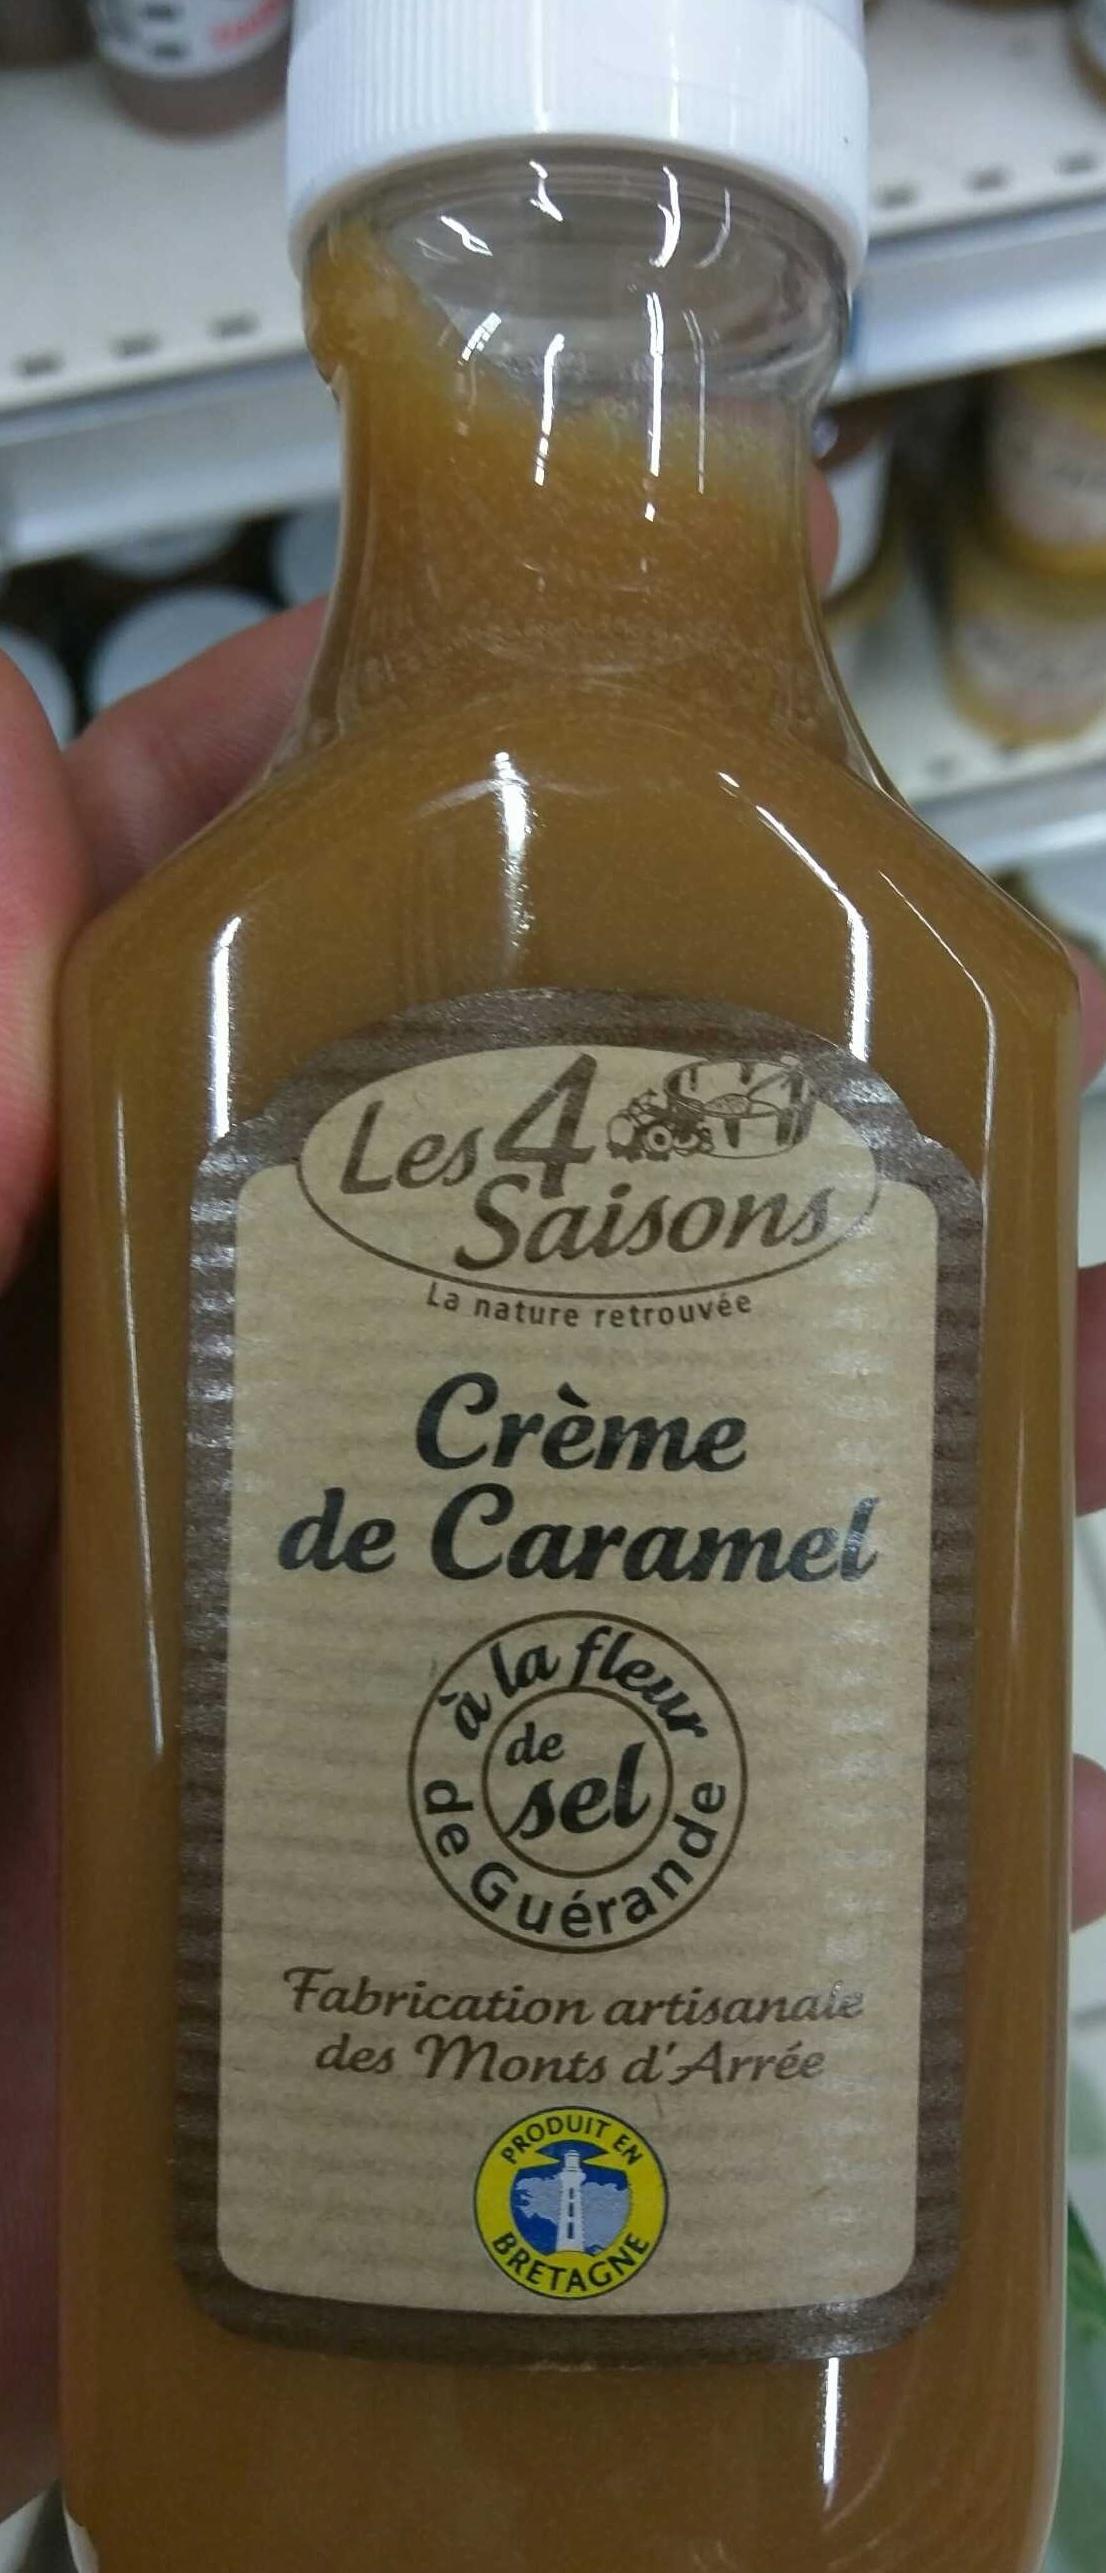 Crême de Caramel à la fleur de sel de Guérande - Product